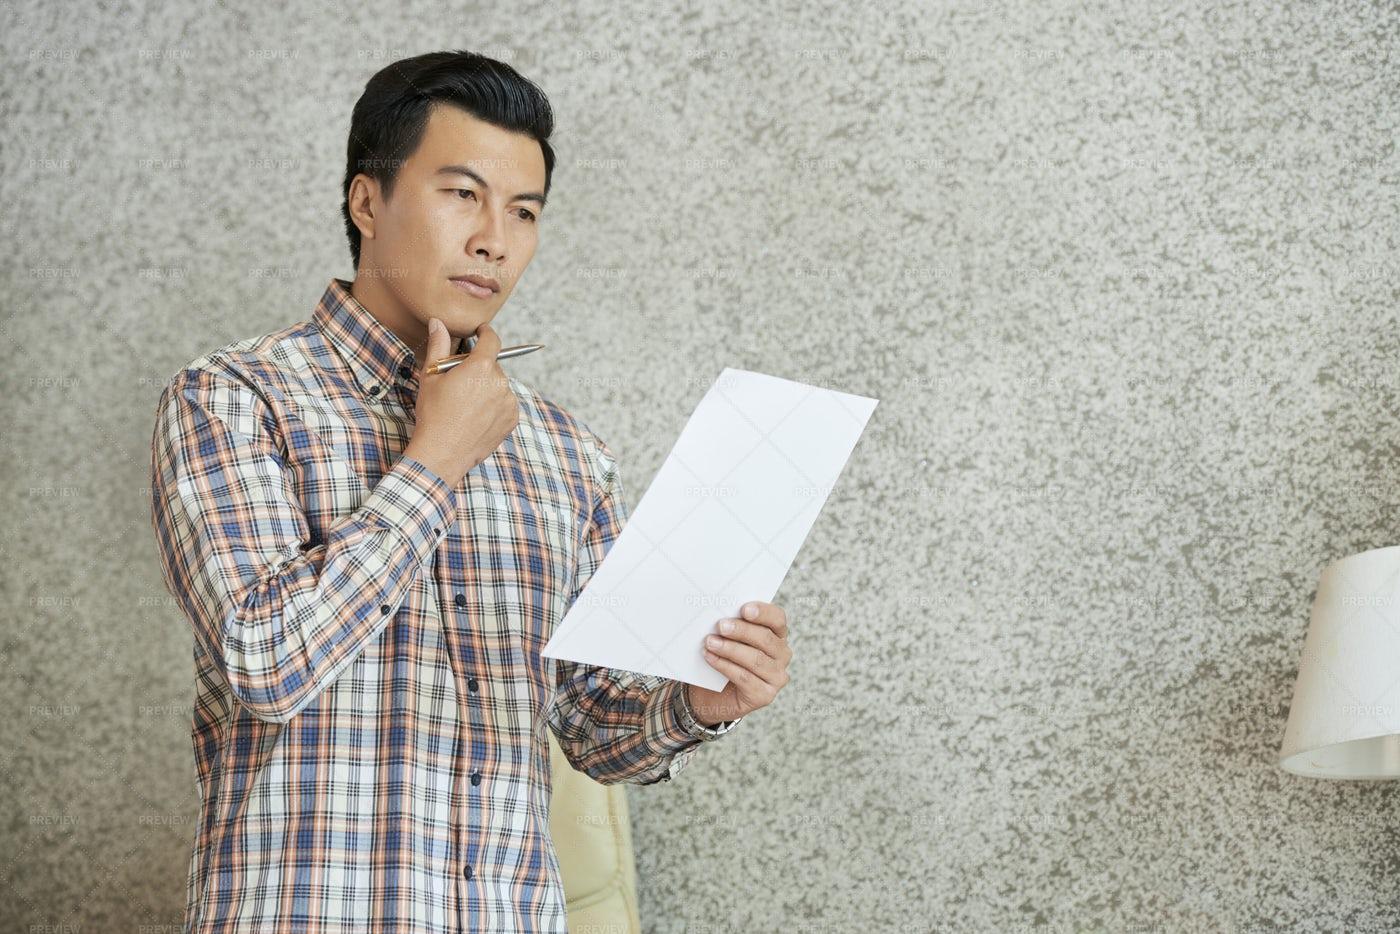 Entrepreneur Reading Document: Stock Photos